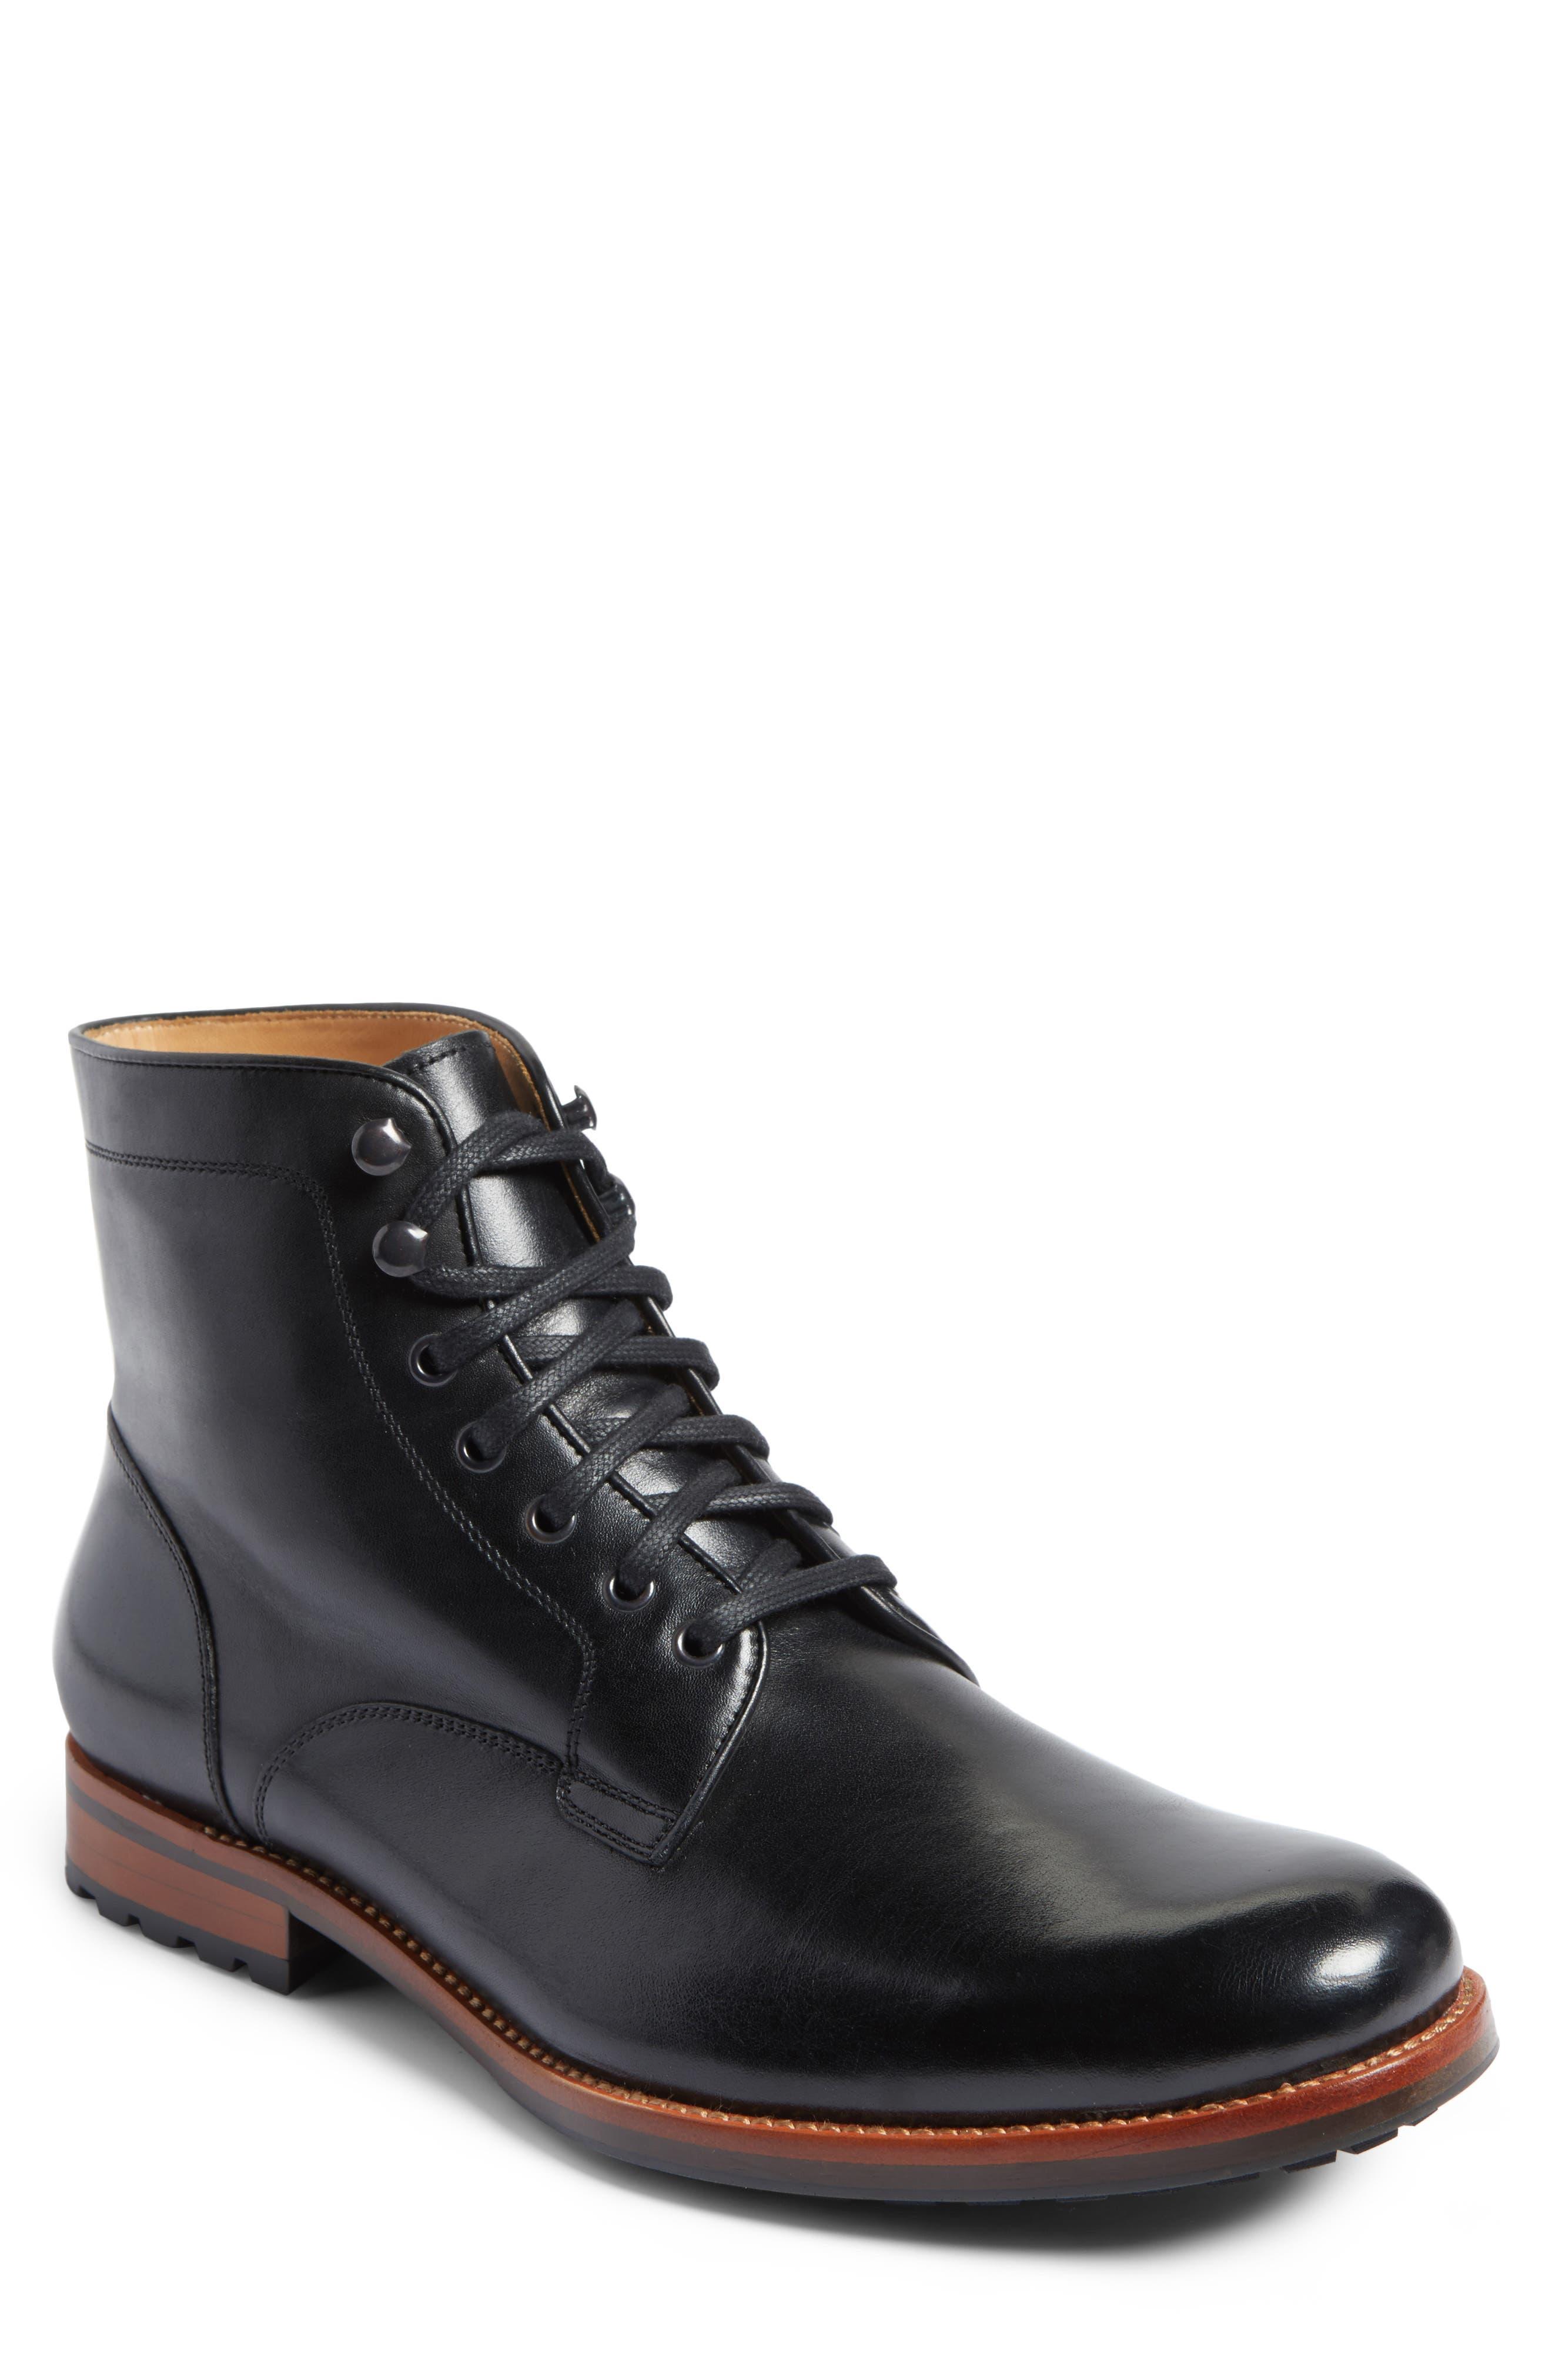 Axeford Plain Toe Boot,                             Main thumbnail 1, color,                             001